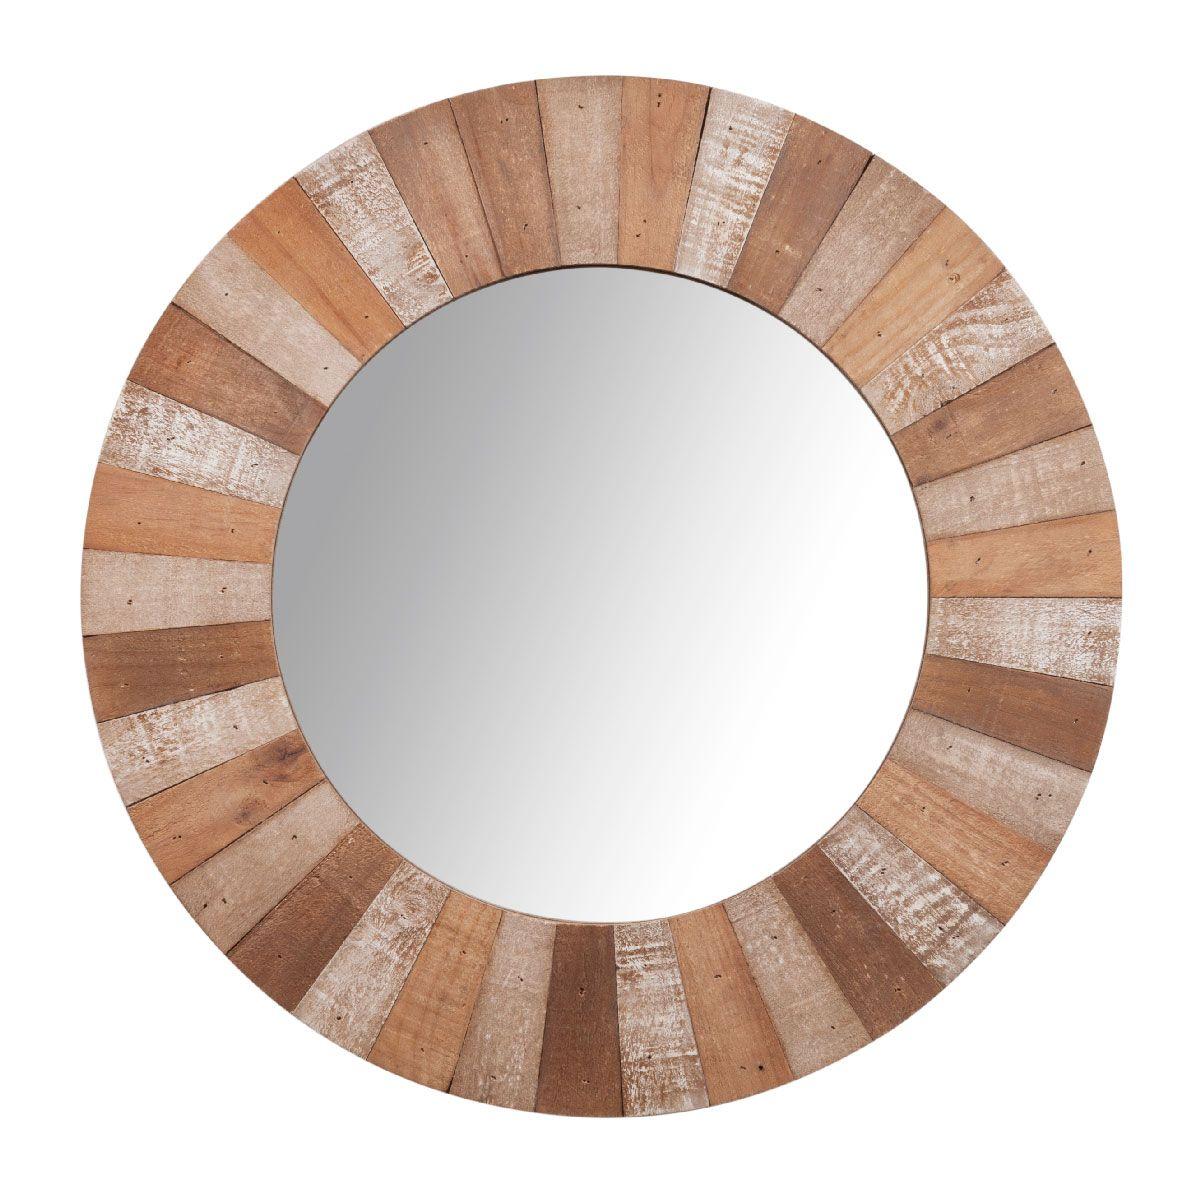 Espejo redondo con marco de madera D 60 cm KARI | marcos redondos ...